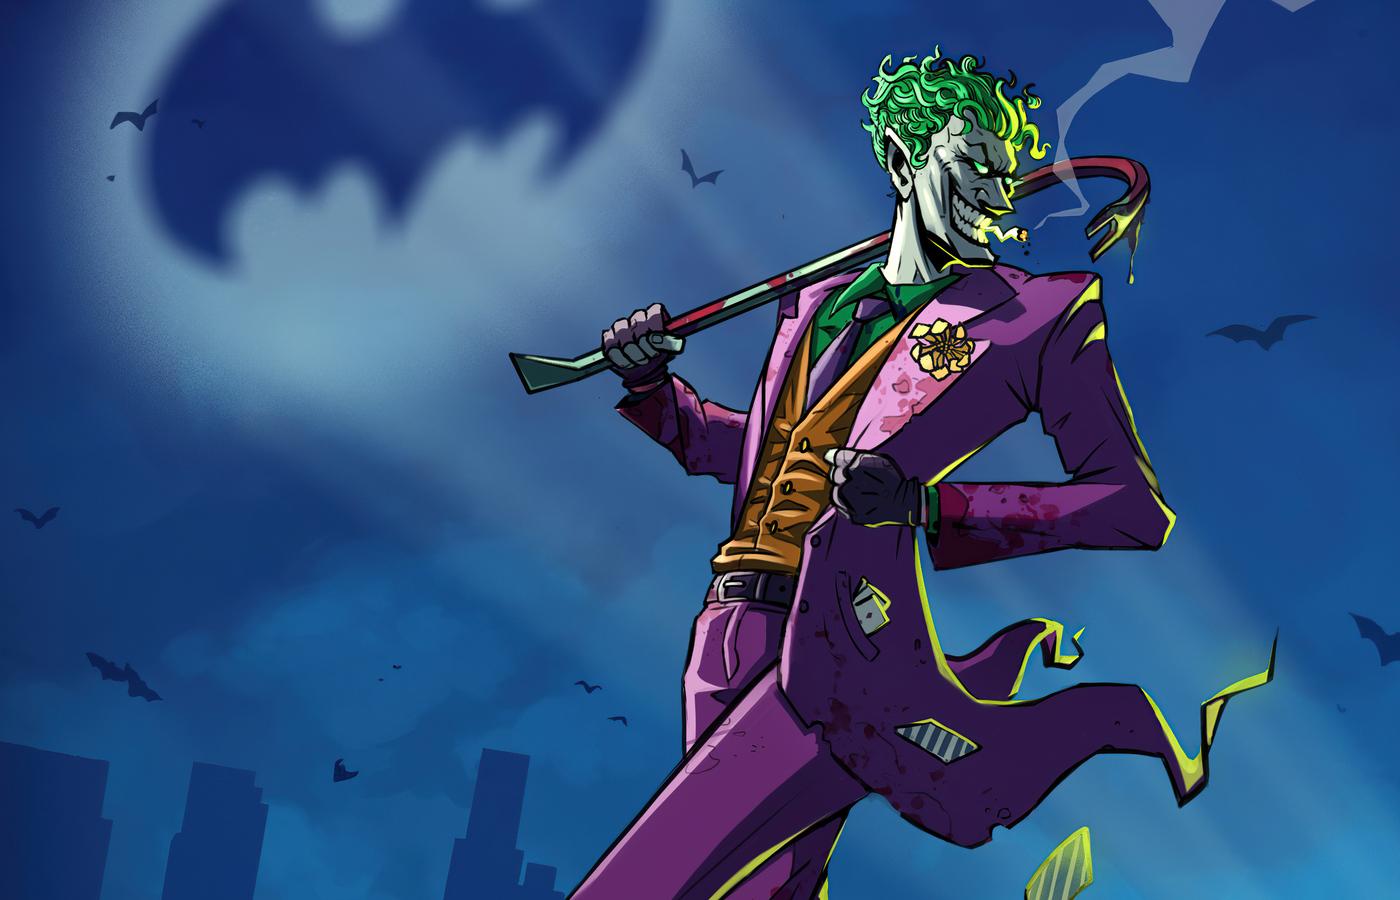 1400x900 Joker Take Over Gotham City 1400x900 Resolution ...